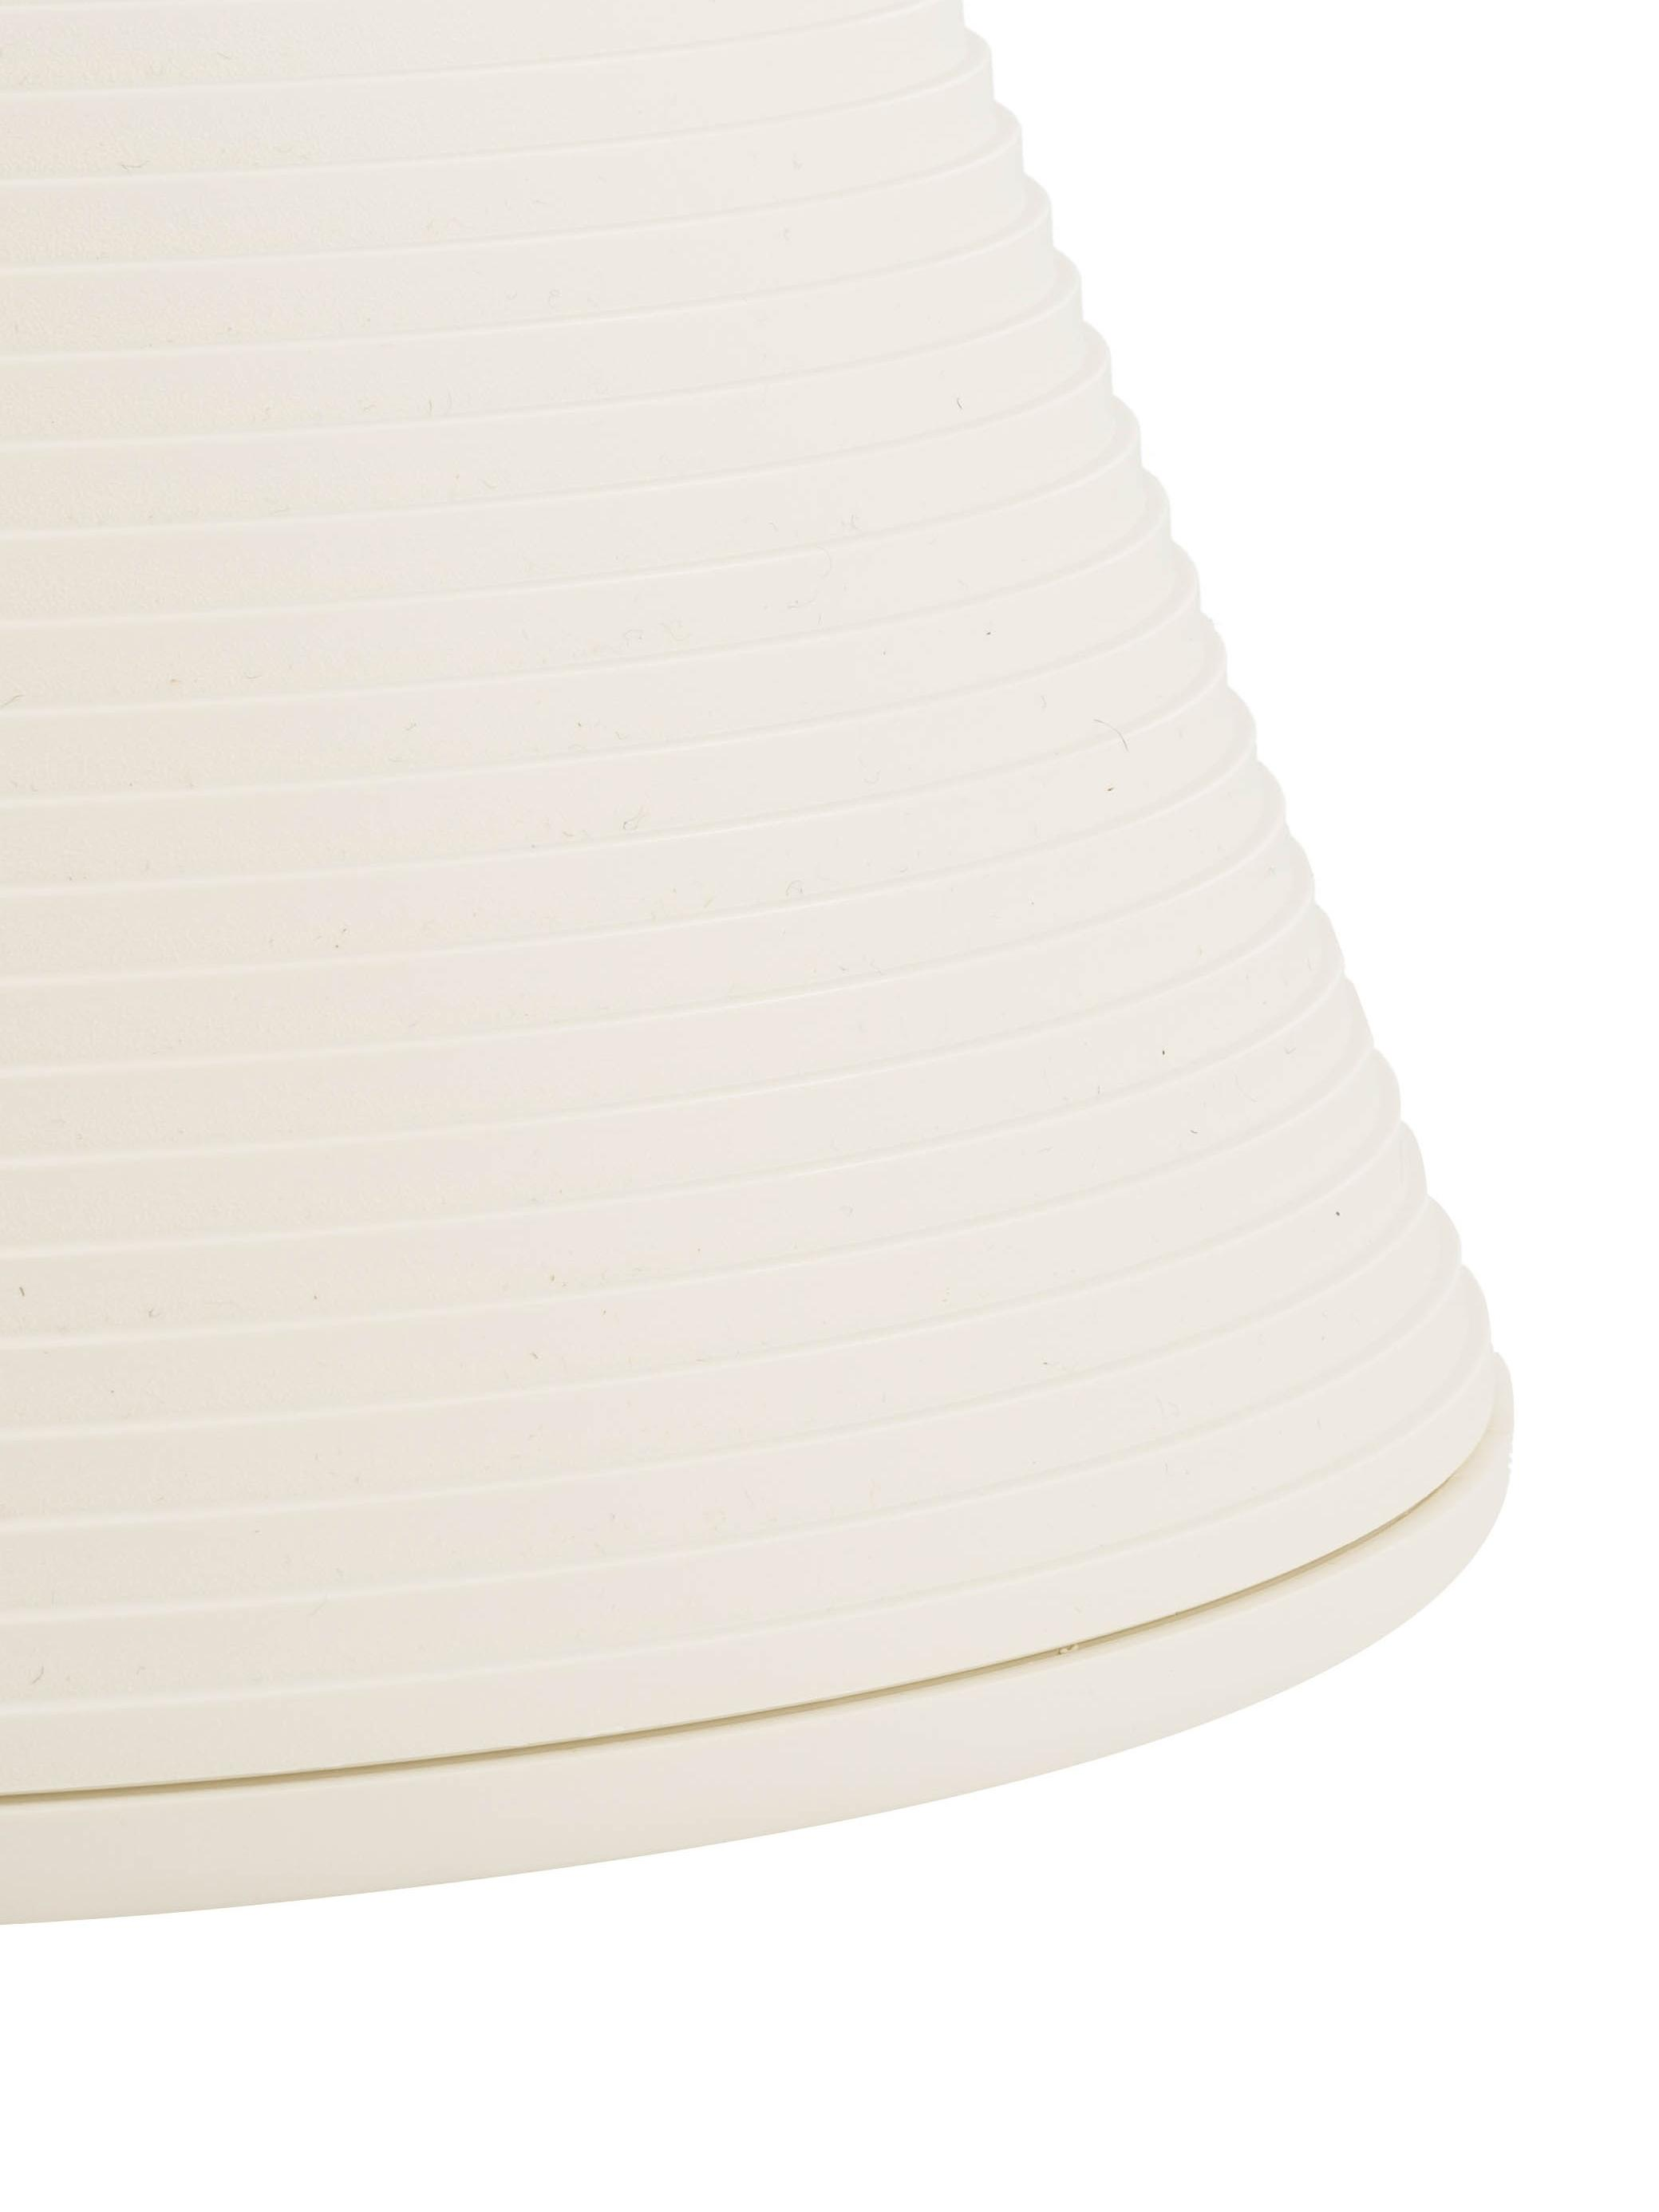 Designový taburet/ odkládací stolek Prince AHA, Bílý vosk